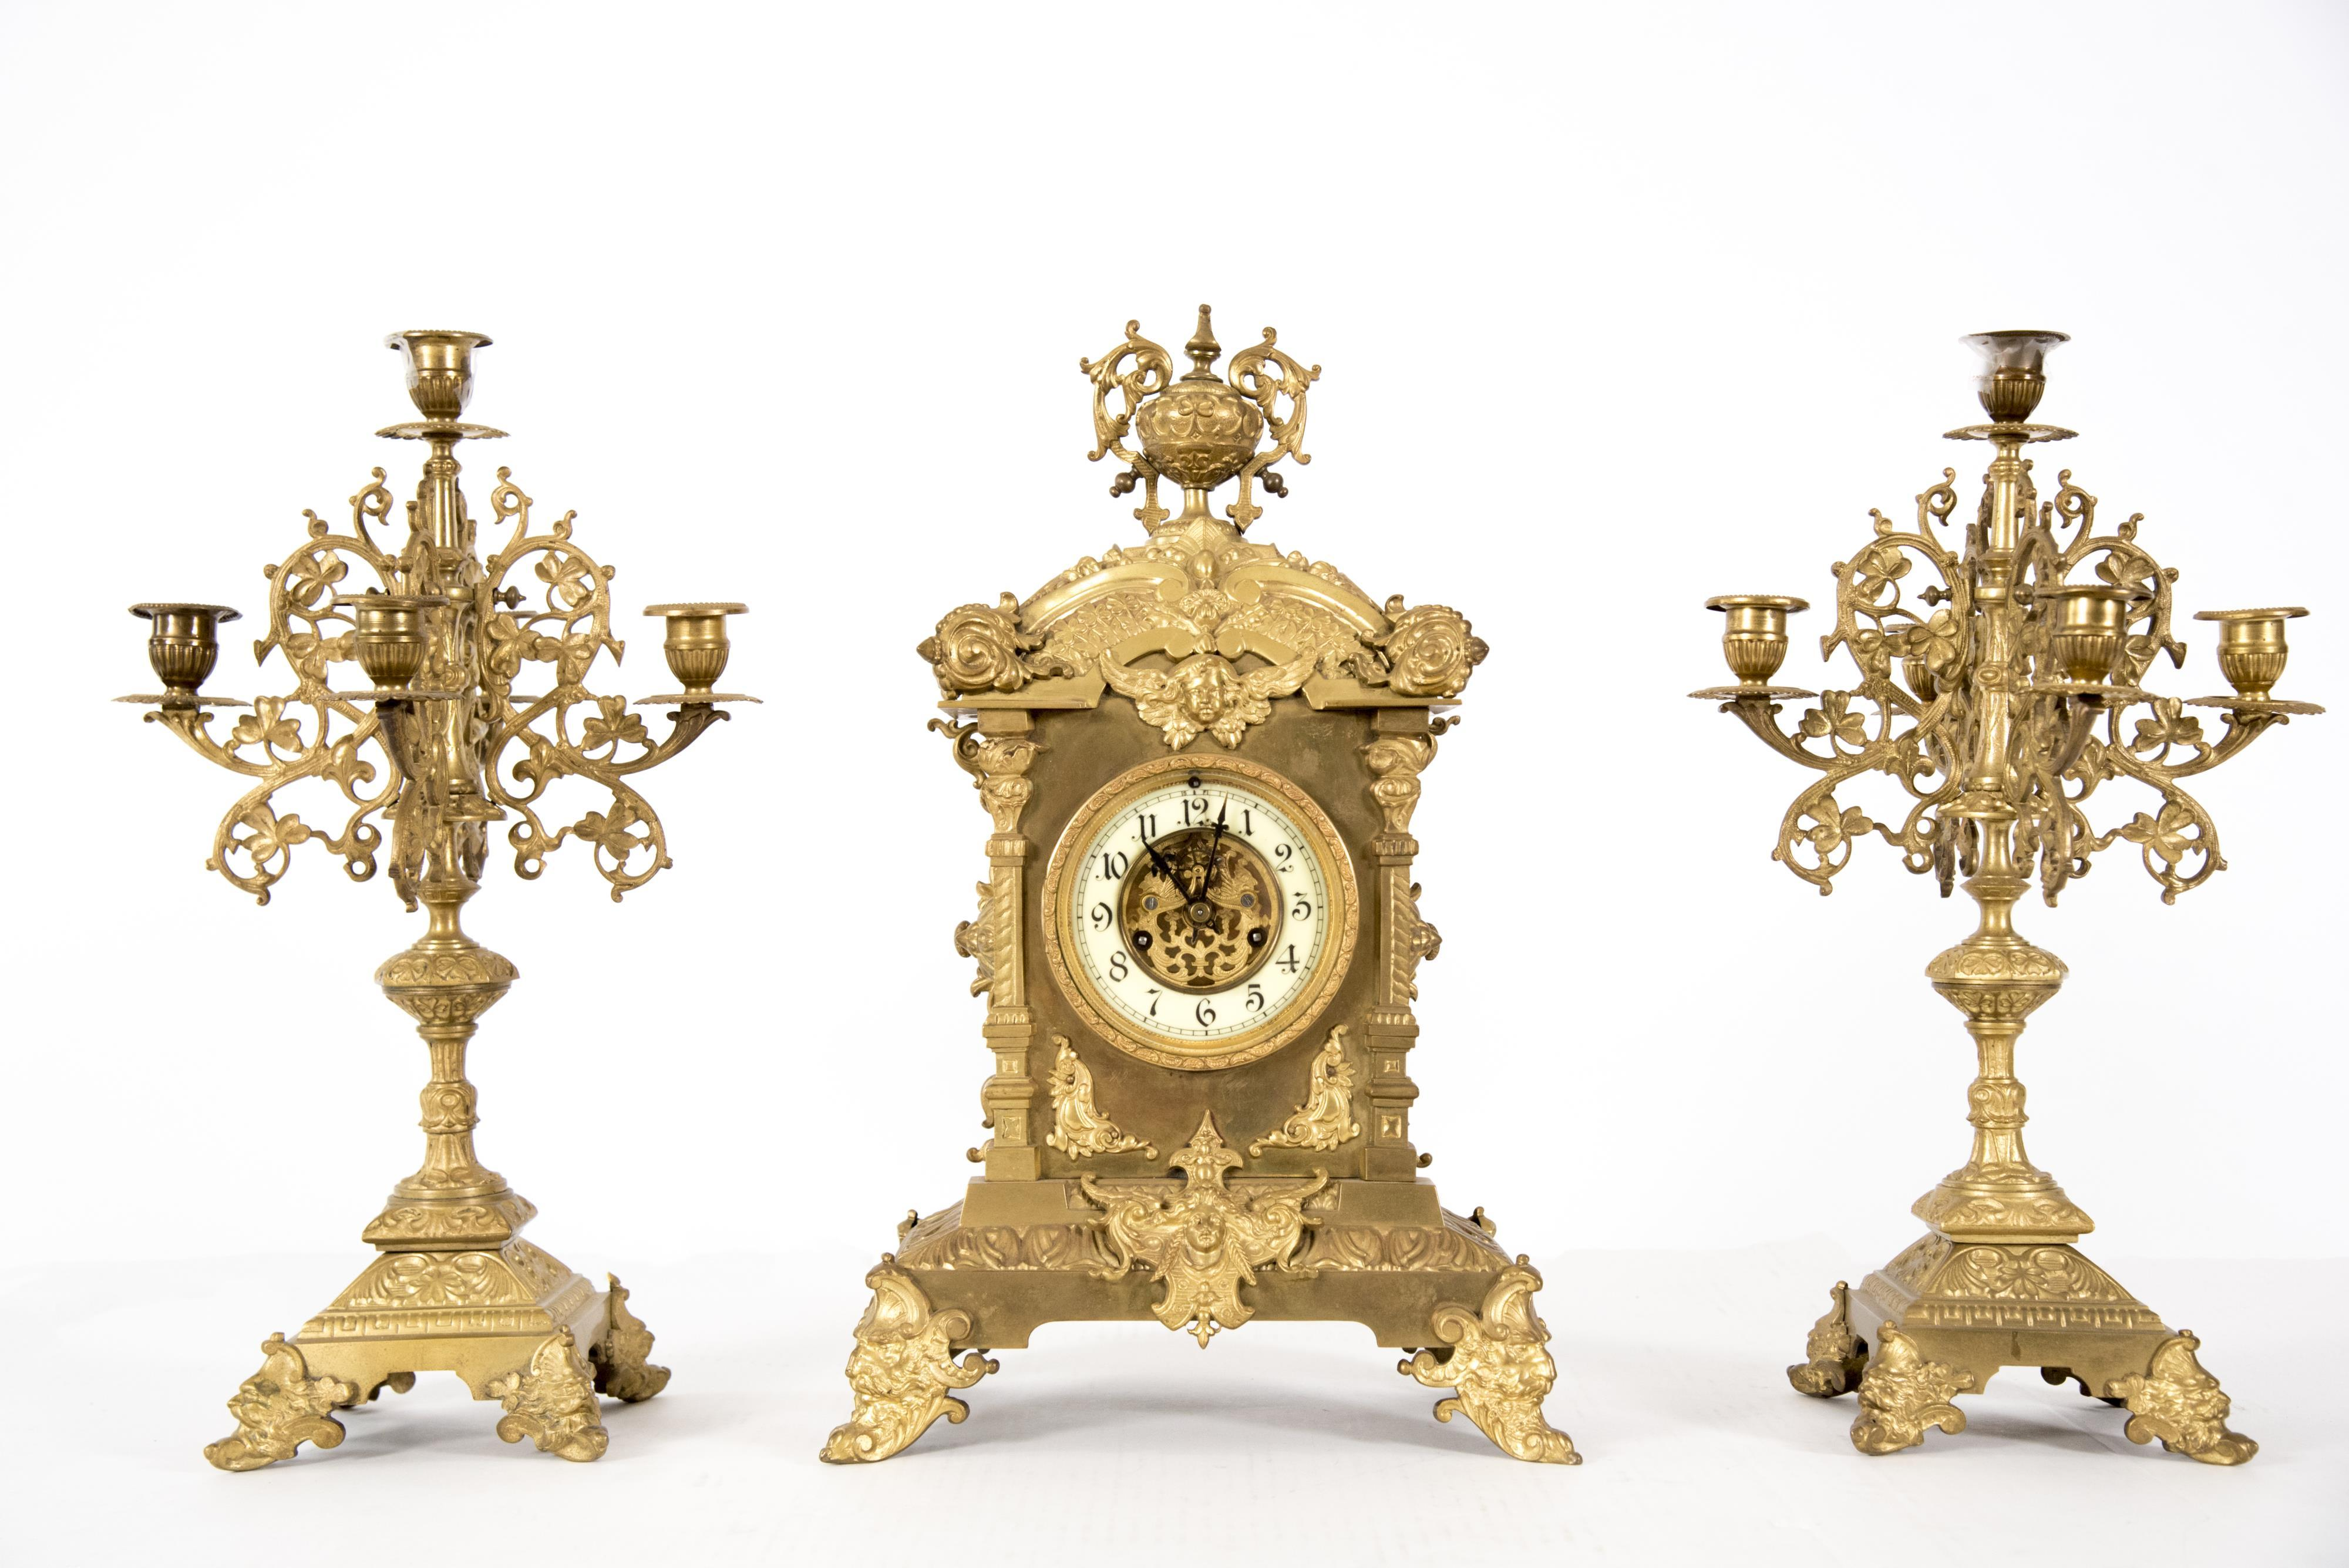 A Waterbury Mantel Clock with Candelabra, 3 Pcs